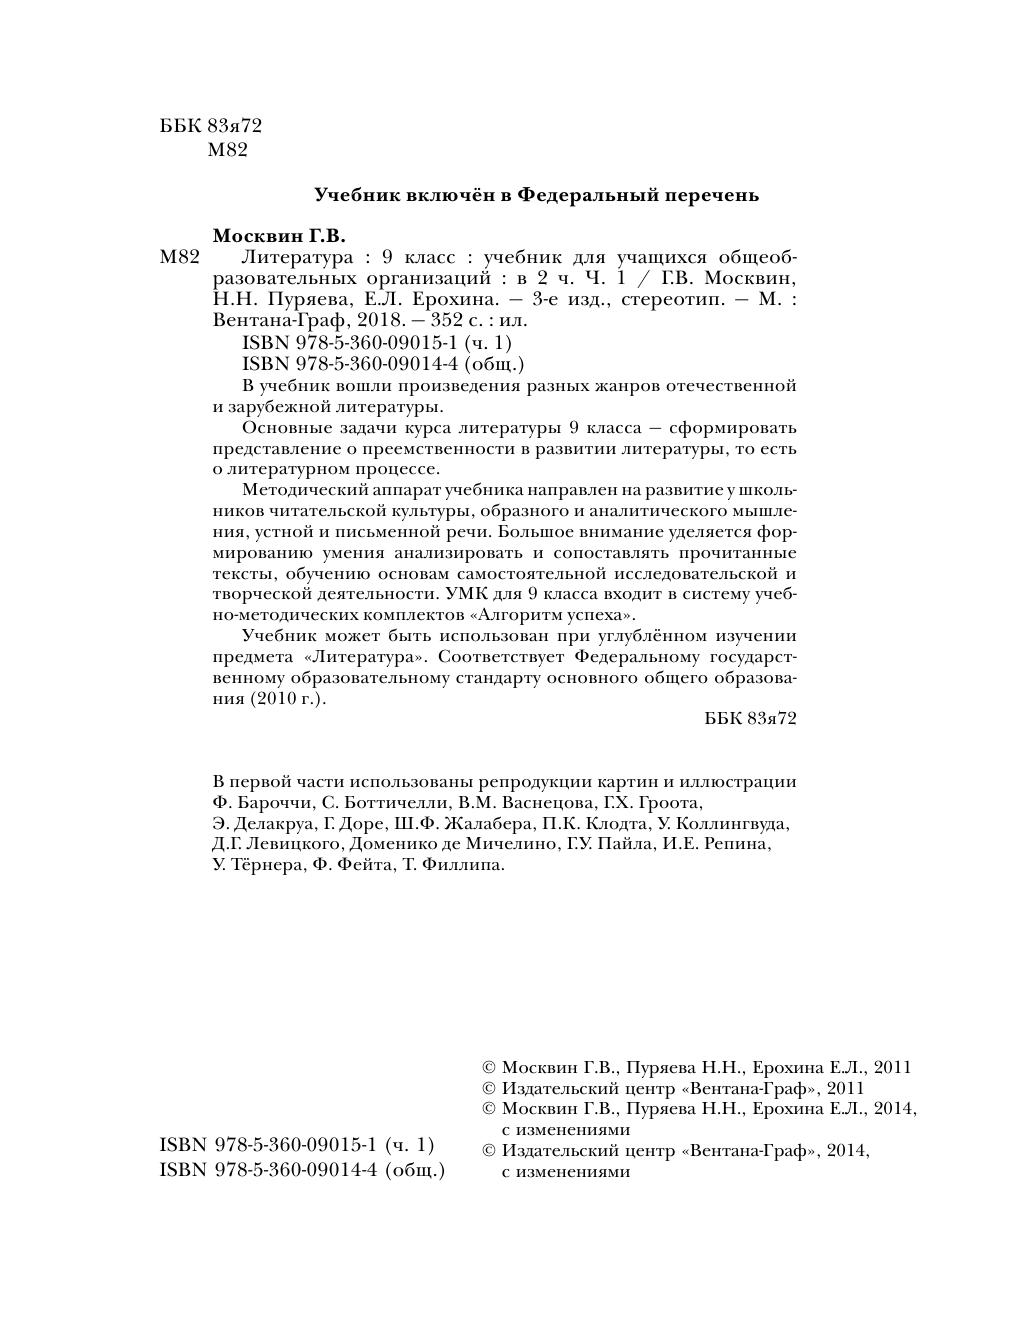 гдз по литературе 7 класс москвин пуряева ерохина